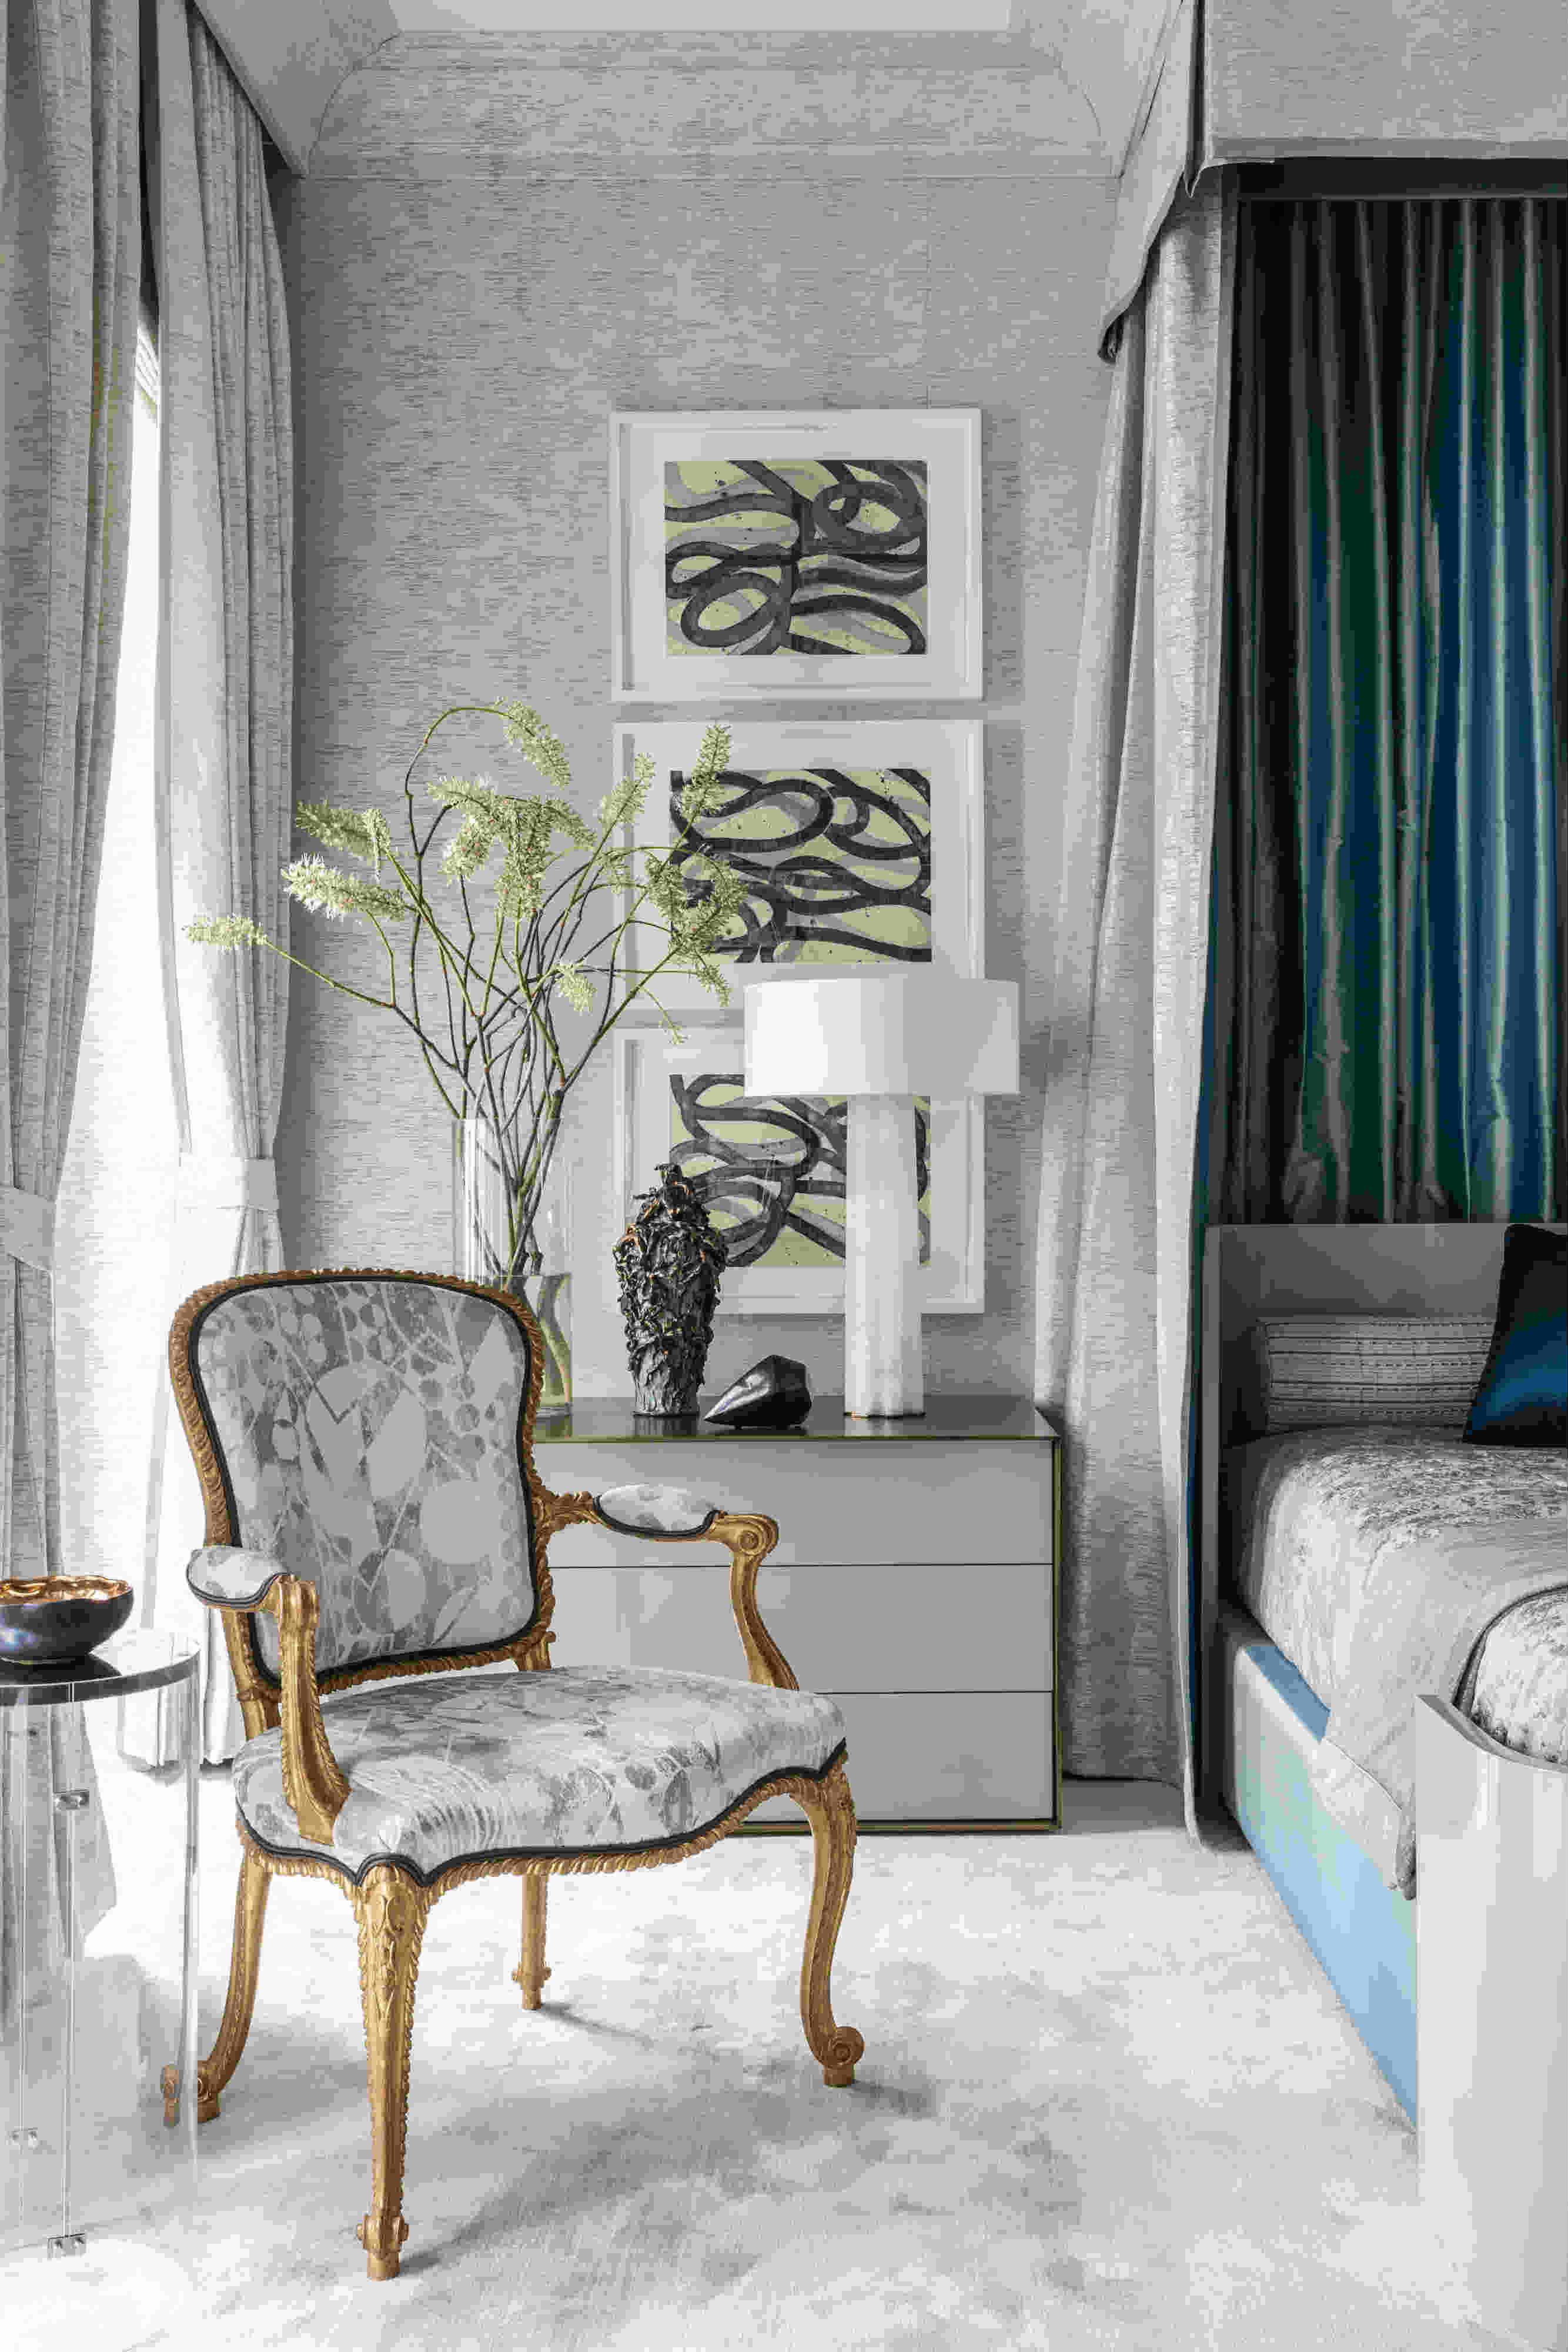 Drake/Andersonu0027s Bedroom, Designed For 2016 Kips Bay Show House